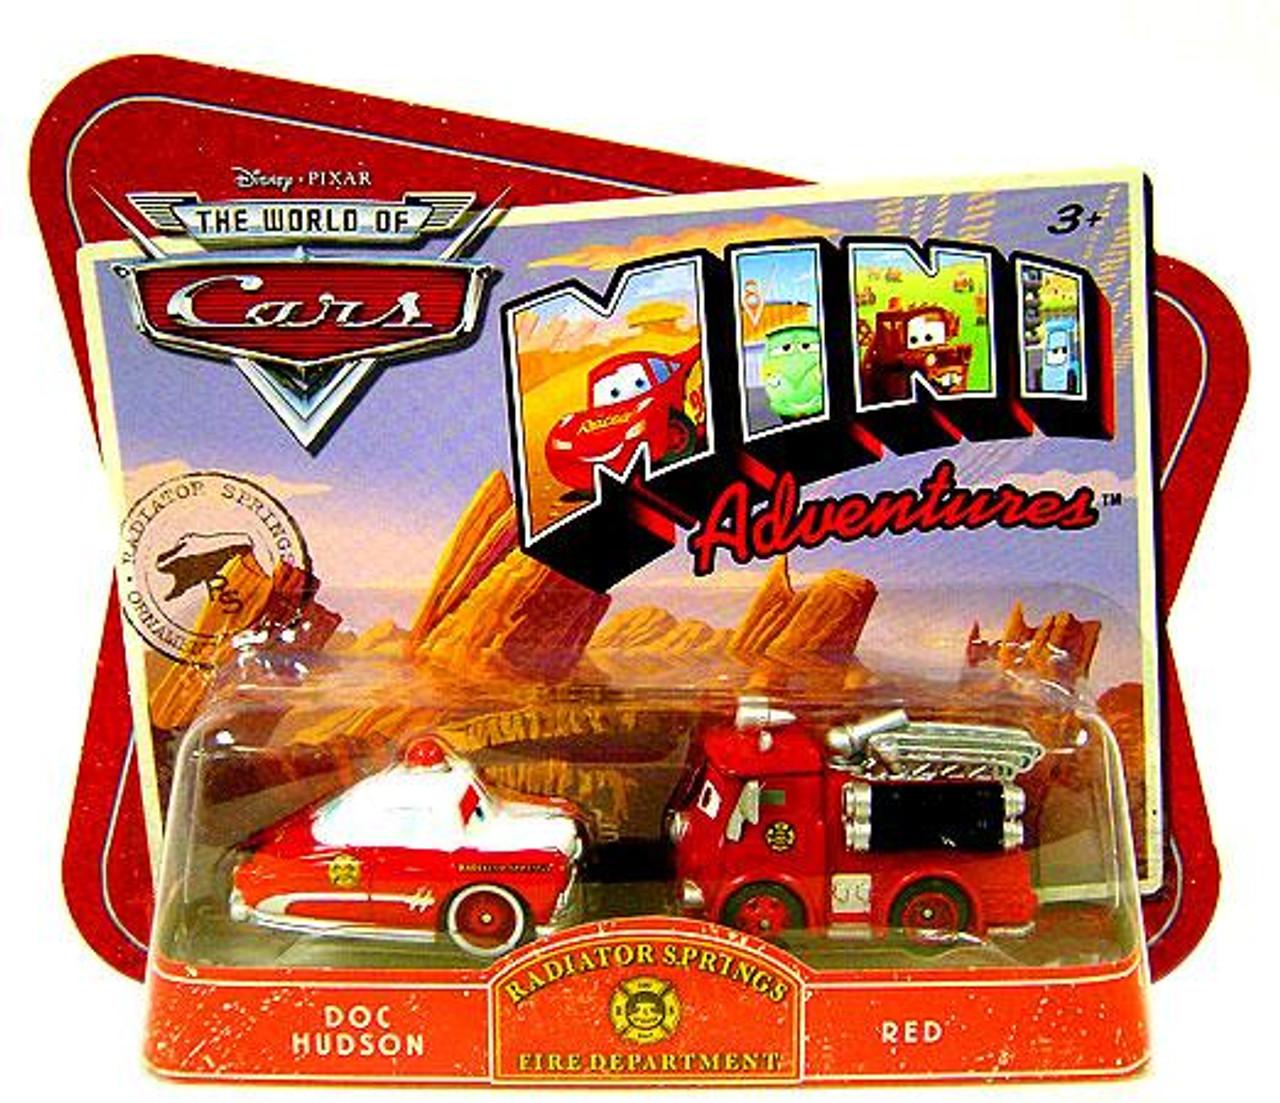 Disney Cars The World of Cars Mini Adventures Radiator Springs Fire Department Plastic Car 2-Pack [Doc Hudson & Red]